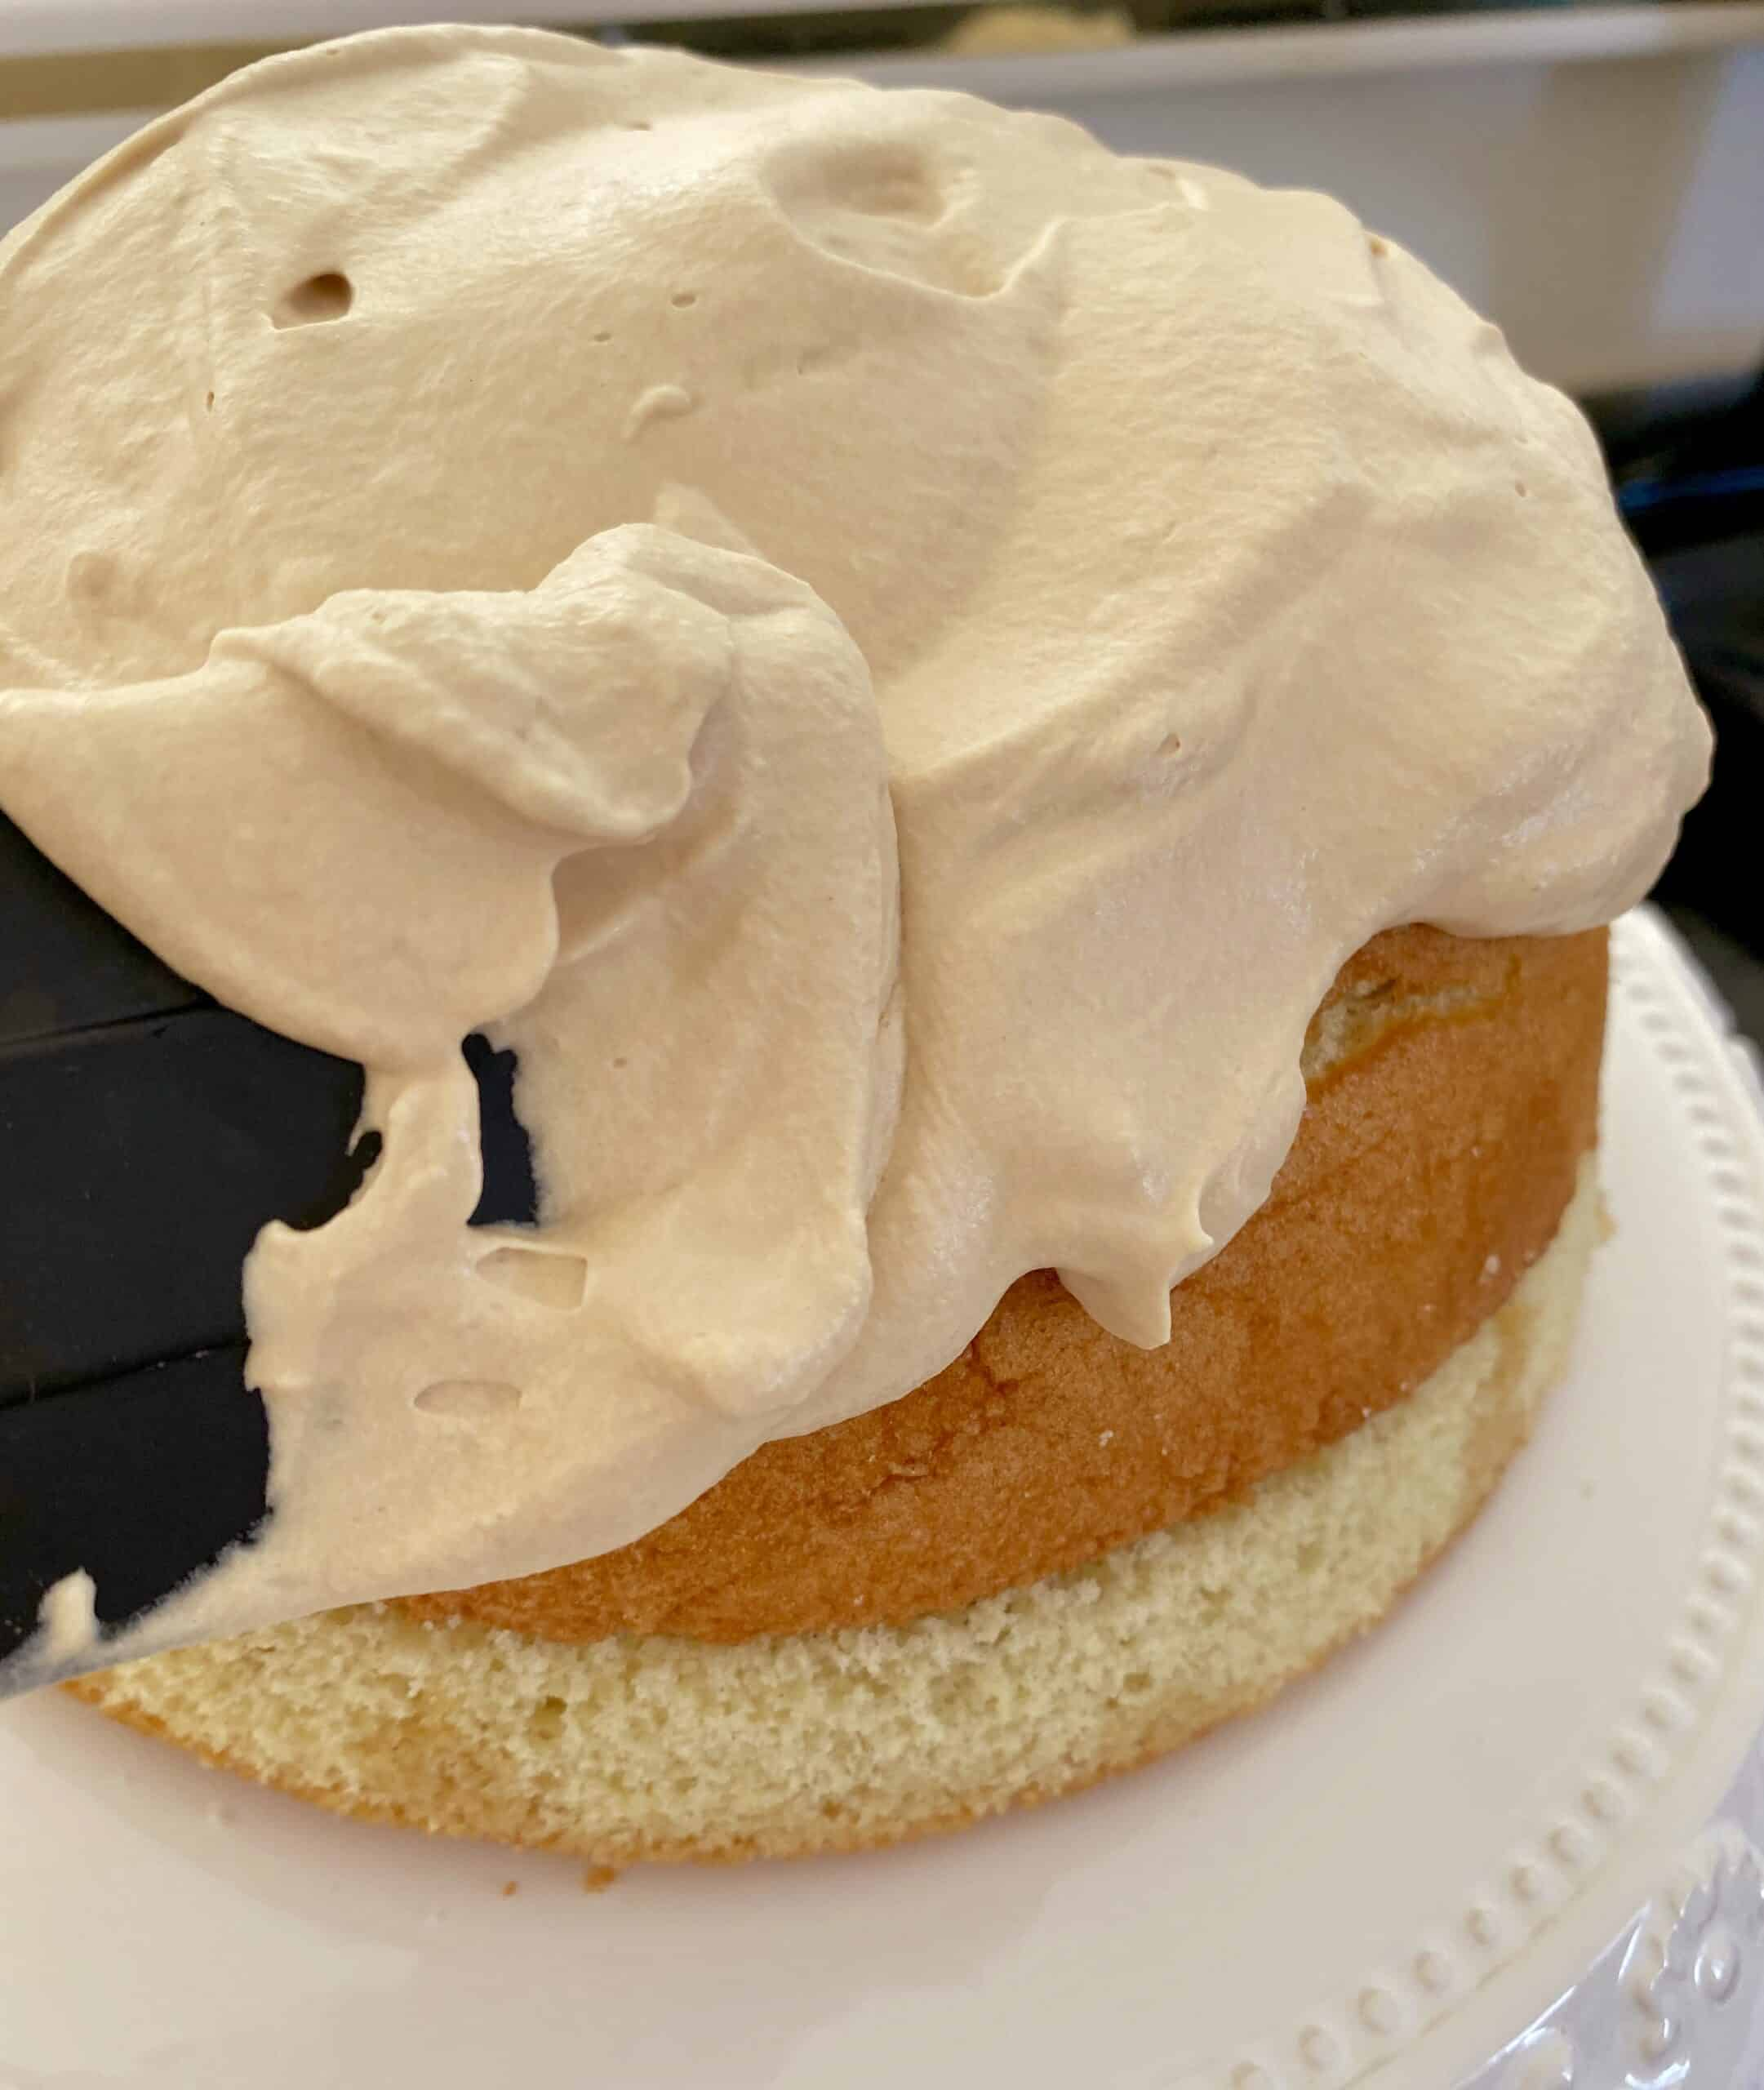 putting cream on the zuccotto